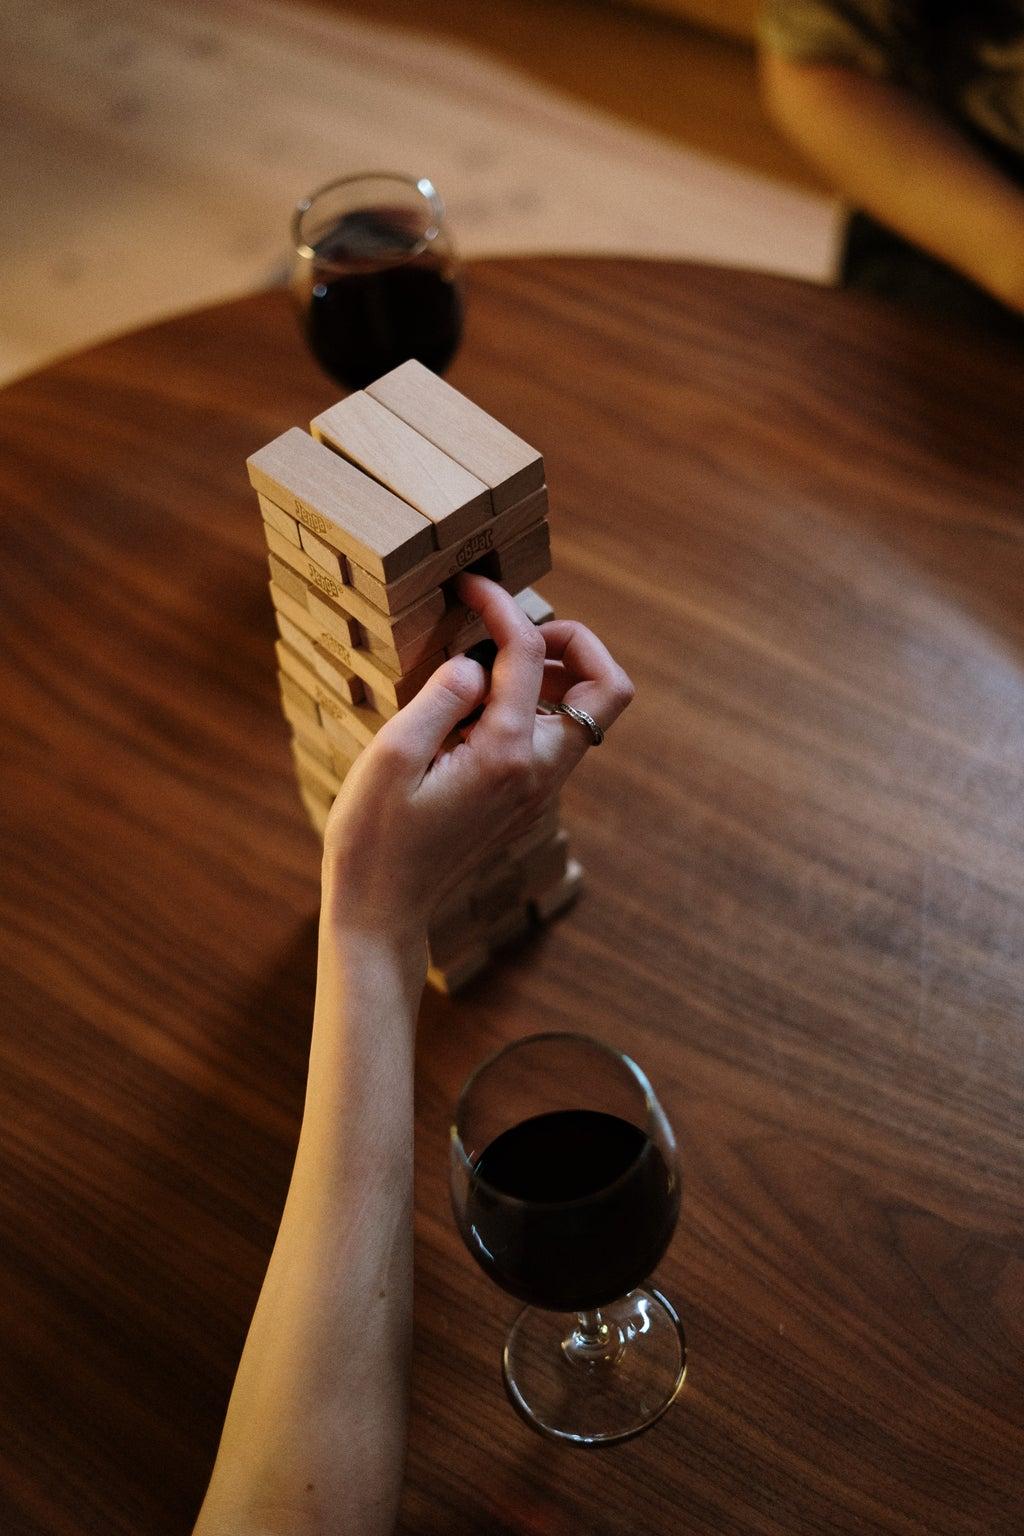 jenga game and wine